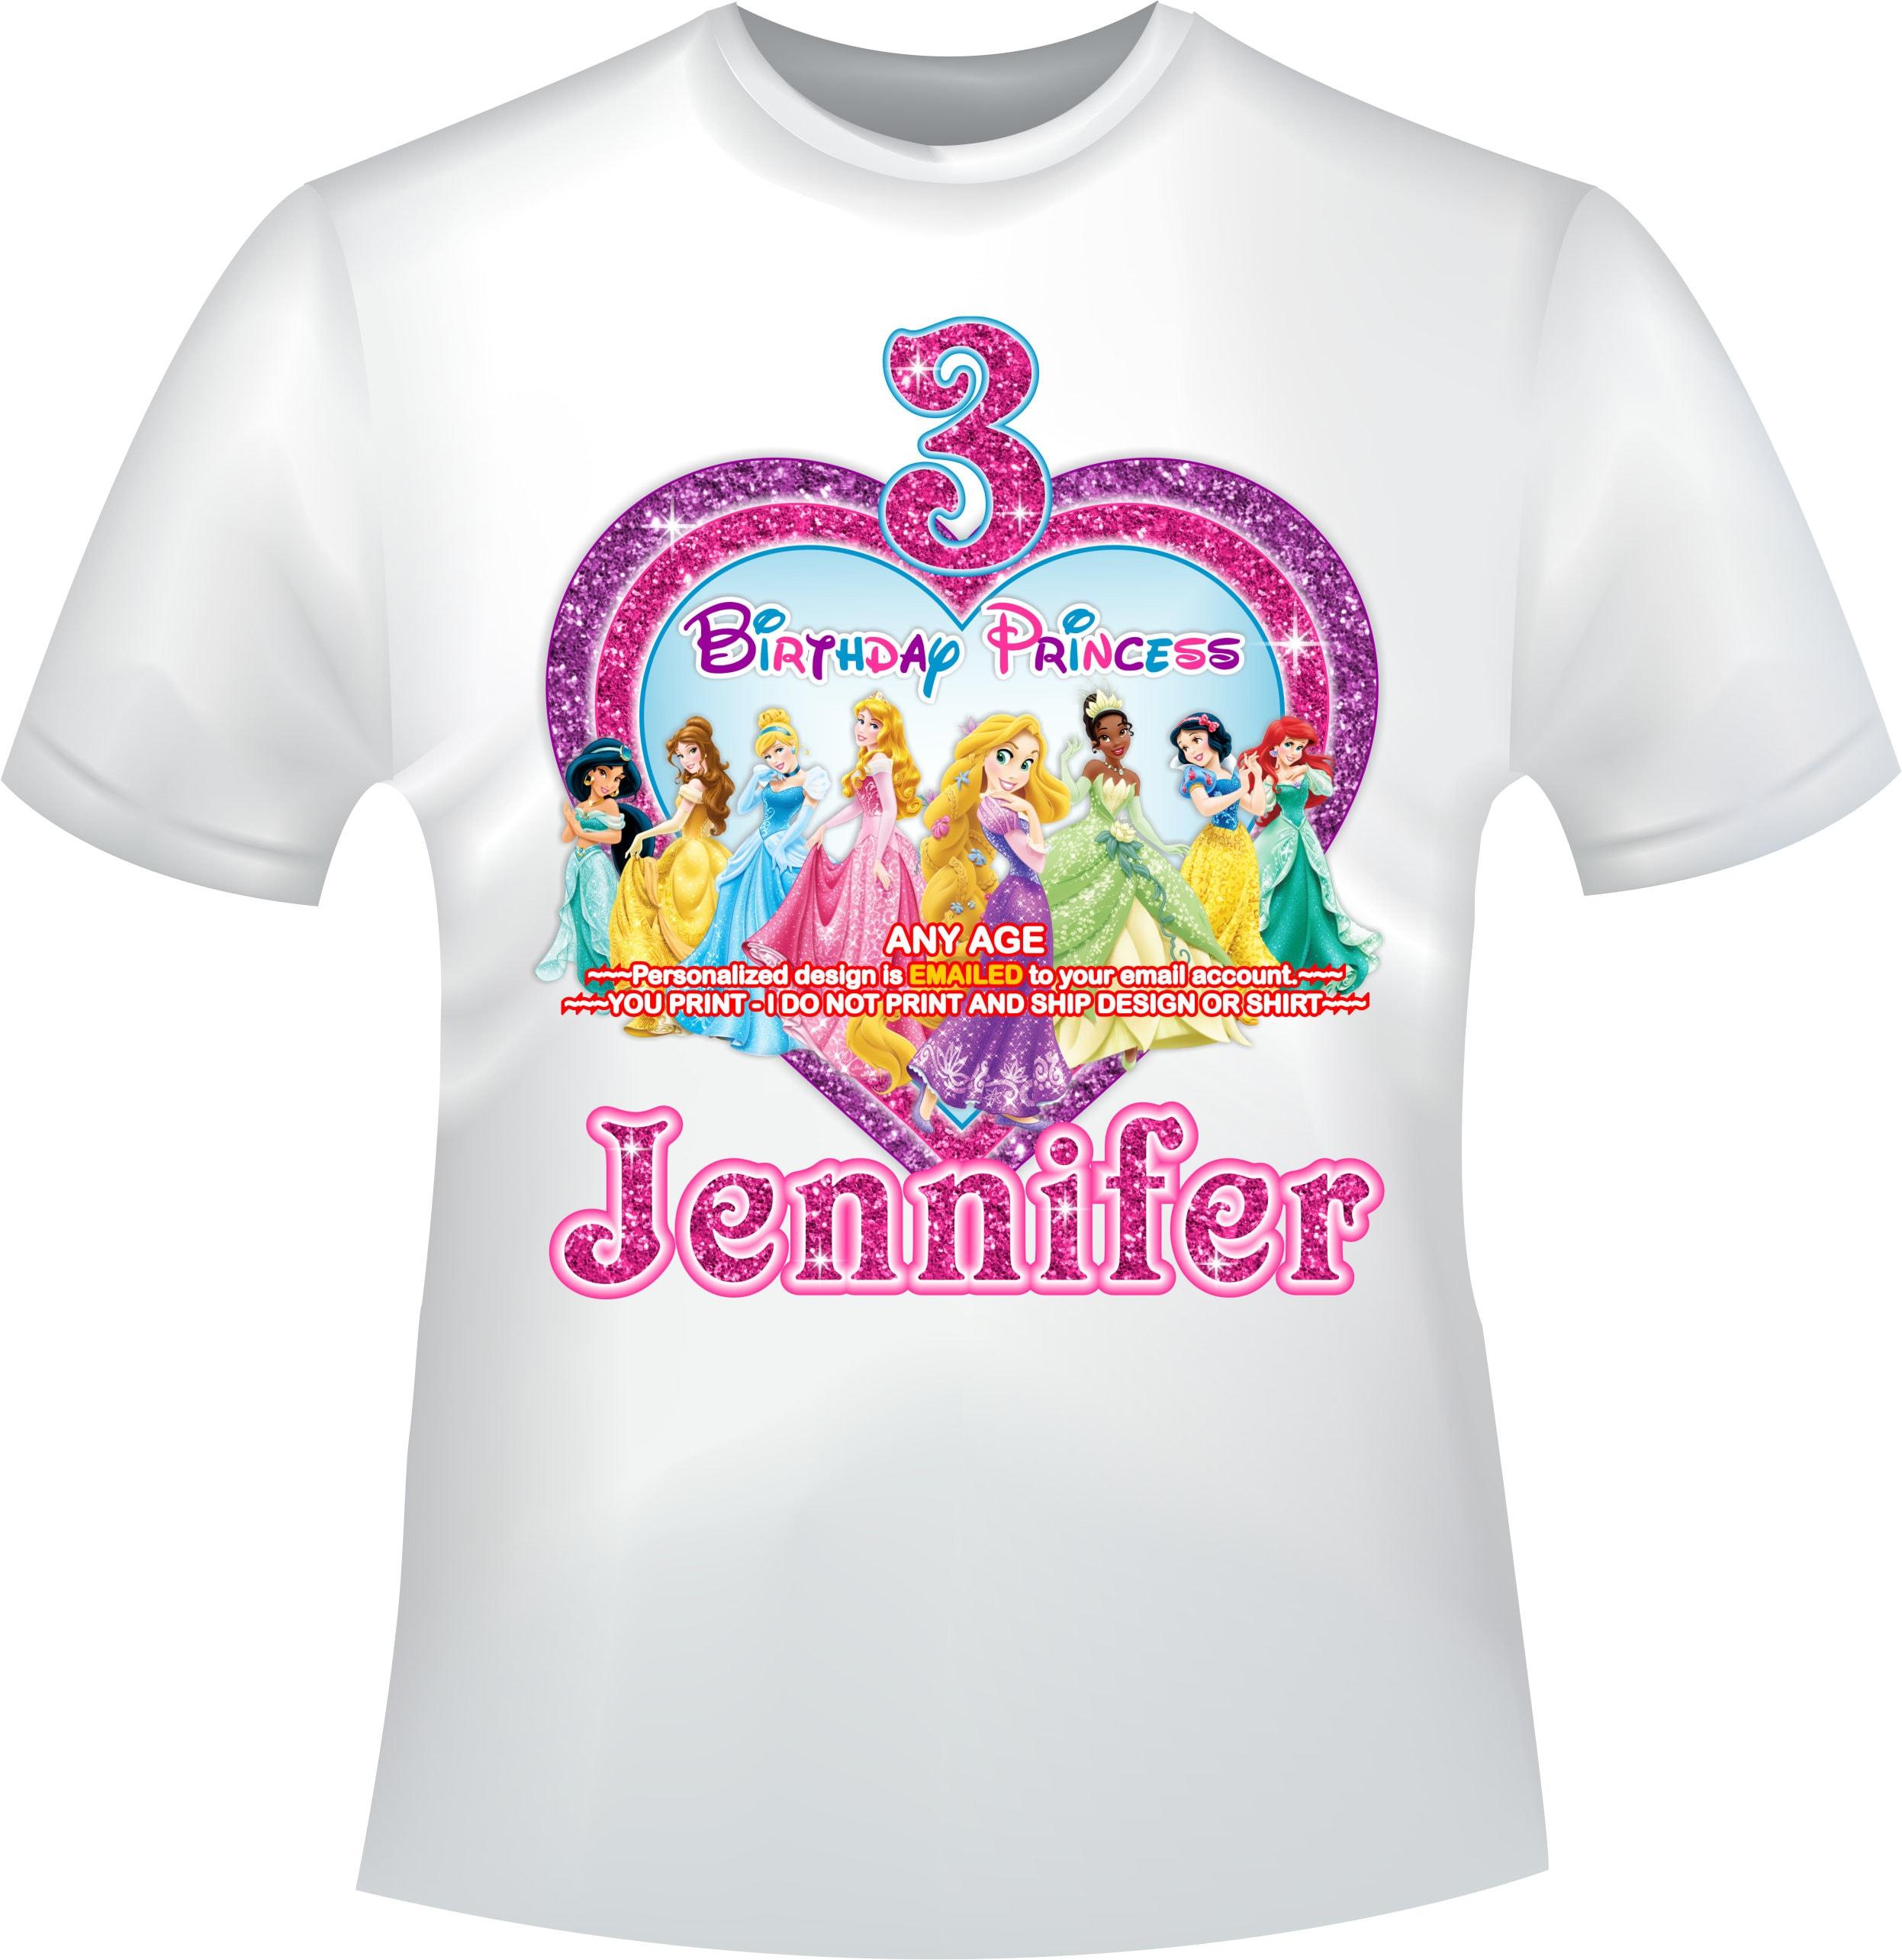 ec717df92 YOU PRINT -Disney Princess Birthday girl iron on, Princess Mommy of iron  on, Princess Daddy of T-shirt ...